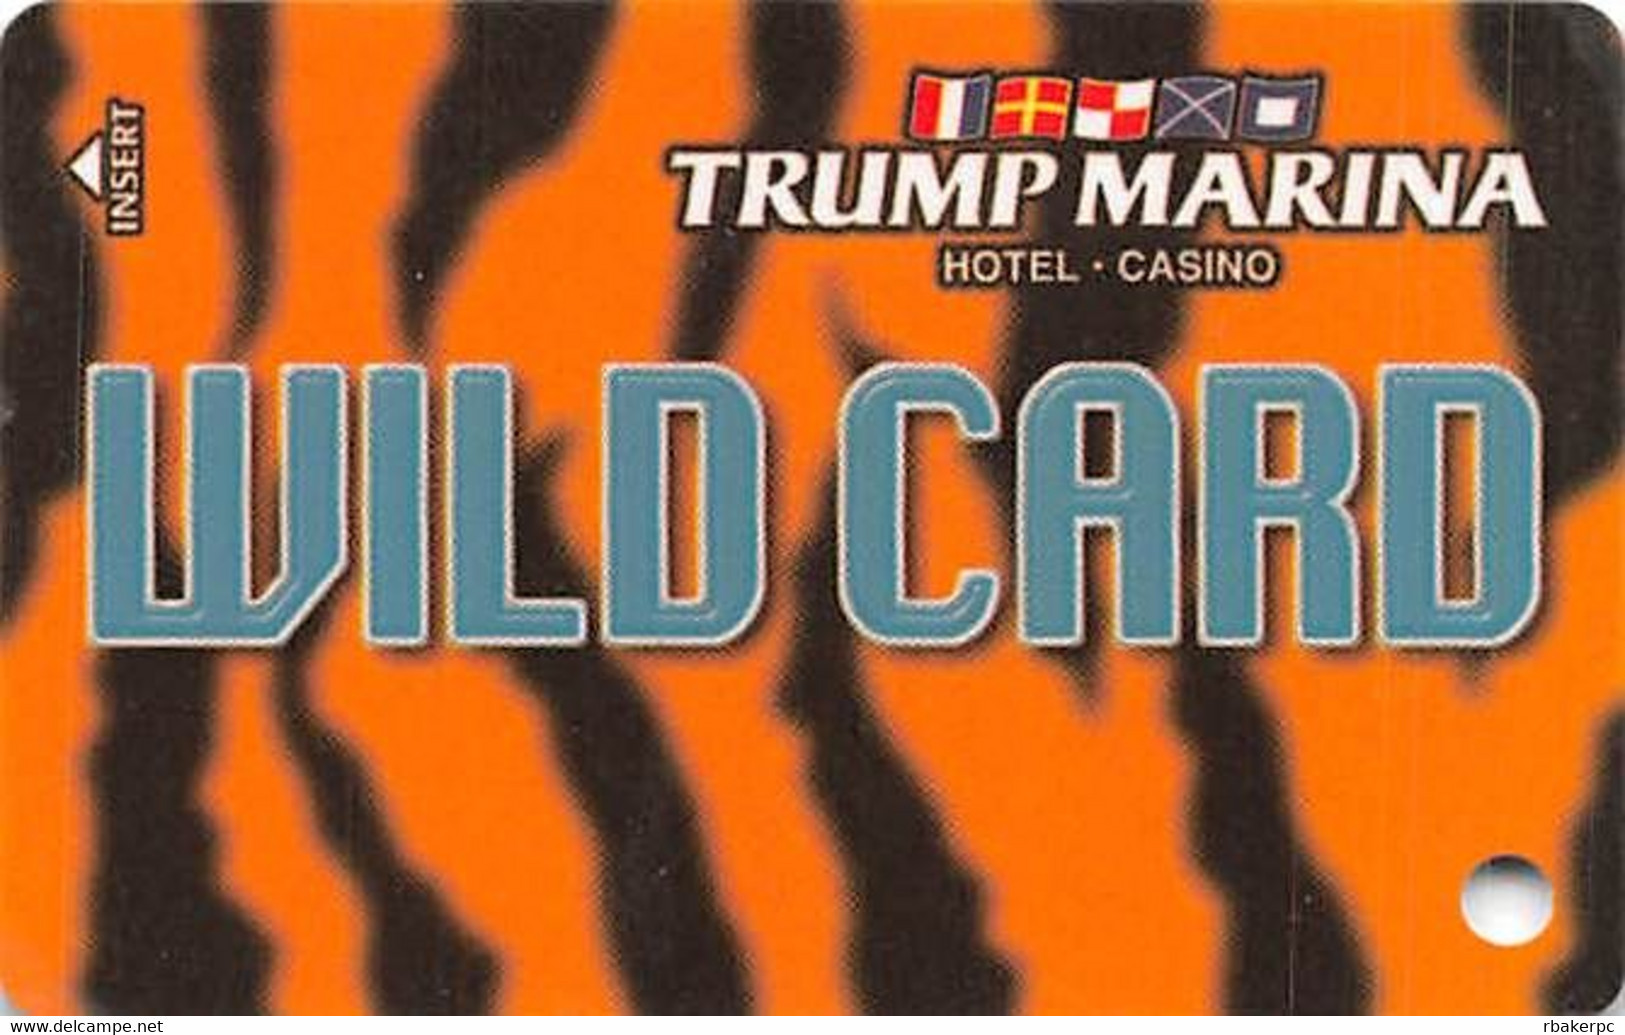 Trump Marina Casino Atlantic City NJ Slot Card  (Blank Without *sm For Copyright) - Casino Cards